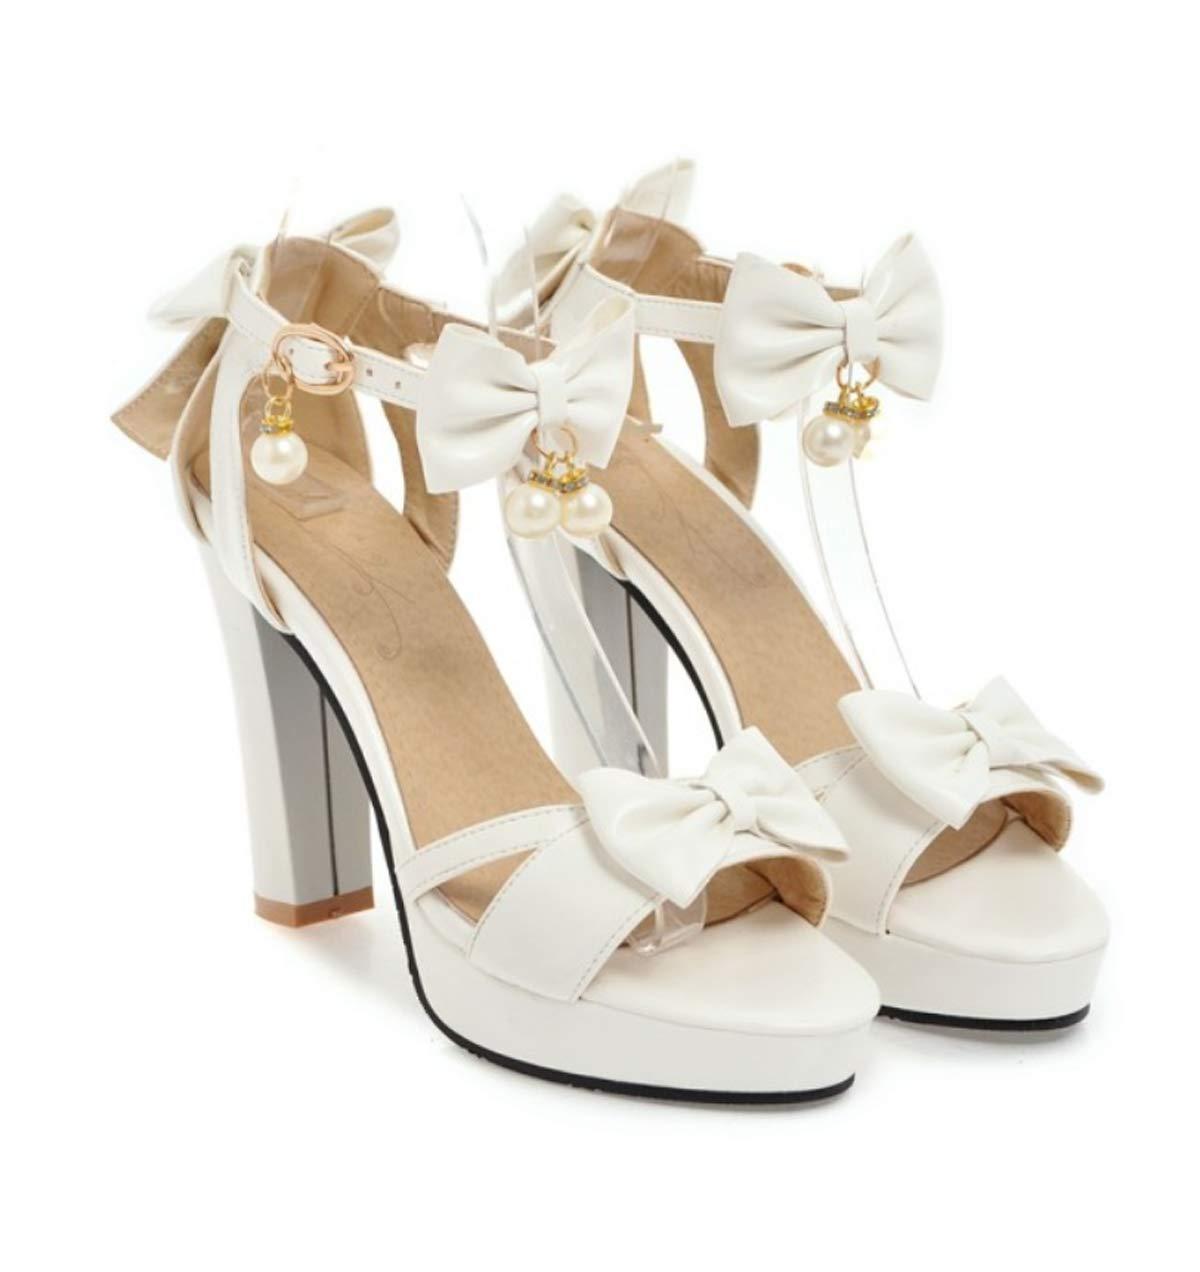 HBDLH Damenschuhe/Im Sommer 10 cm High Heels Damenschuhe Fliegen Prinzessin Schuhe Wasserdicht Plattformen.